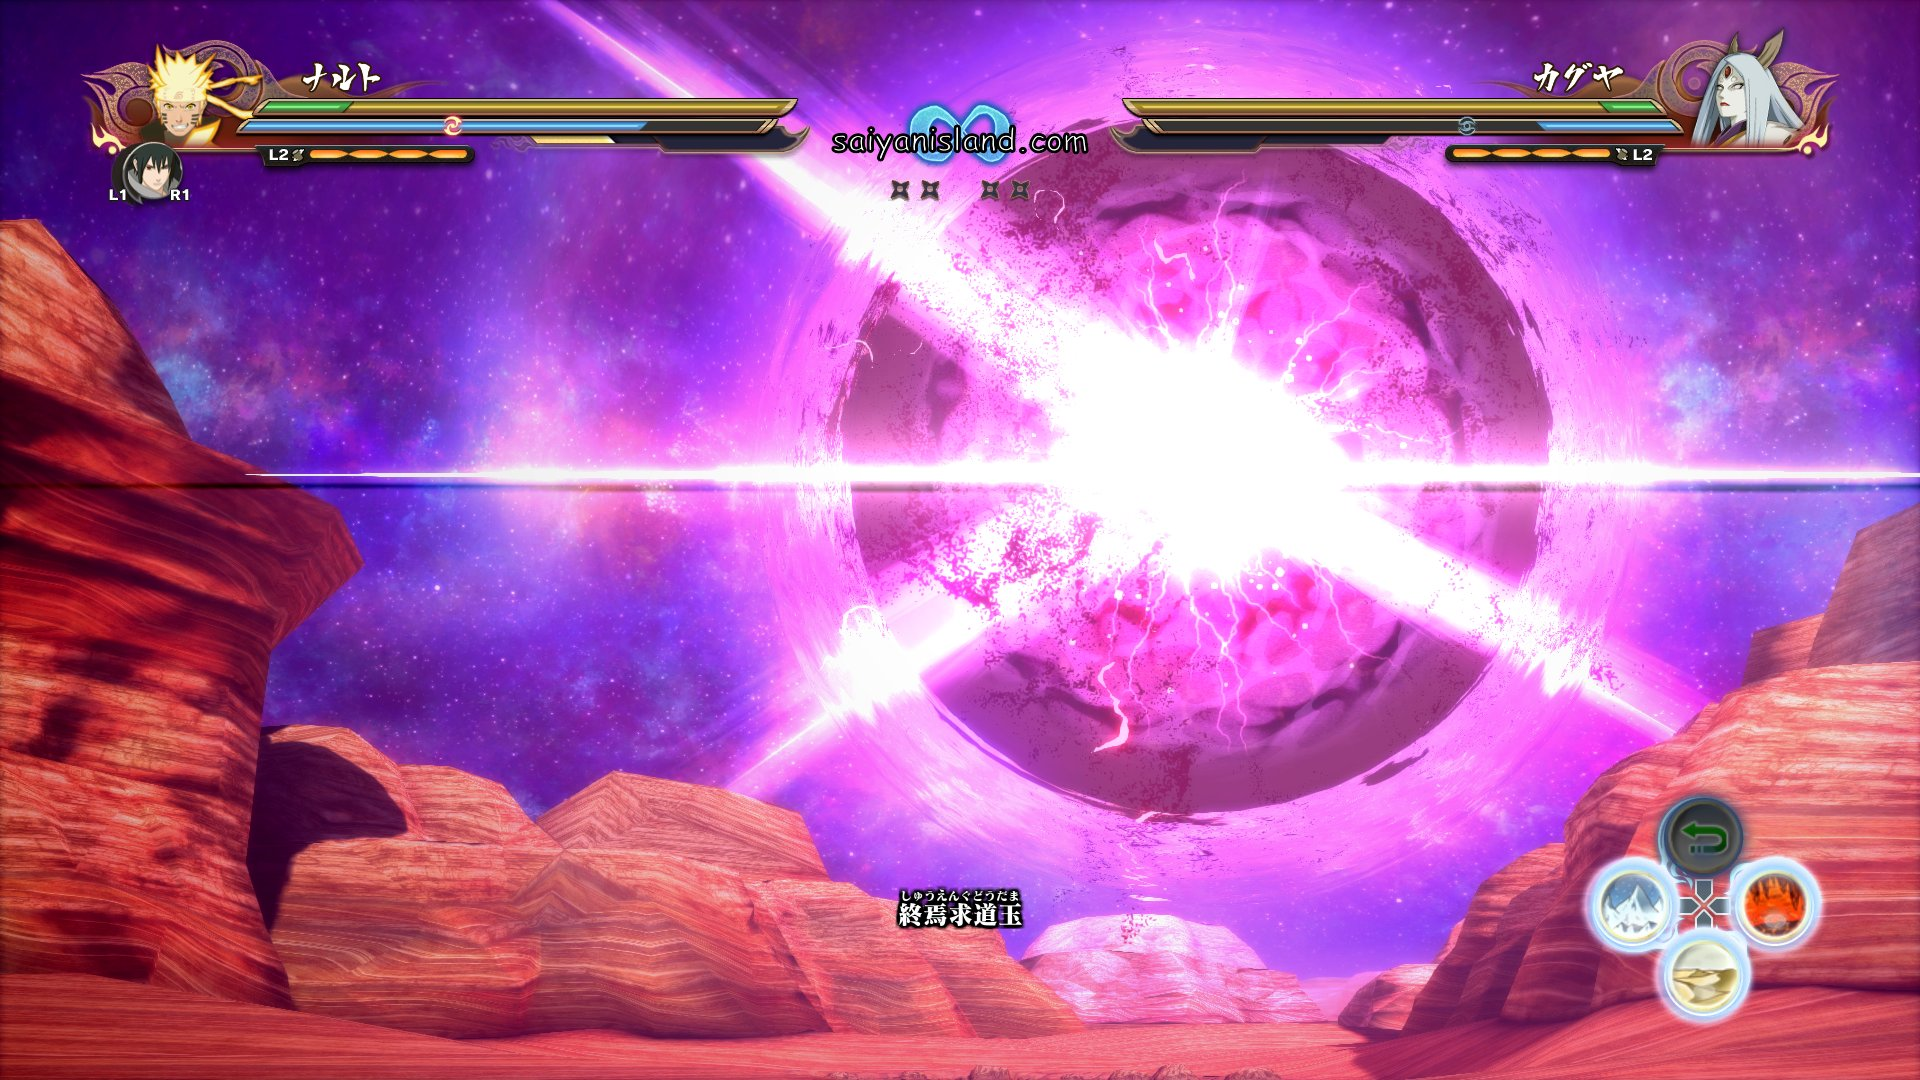 Naruto-Storm-4-9 Naruto Storm 4: Yeni Kuyruklu Canavar Kaguya Ekran Görüntüleri